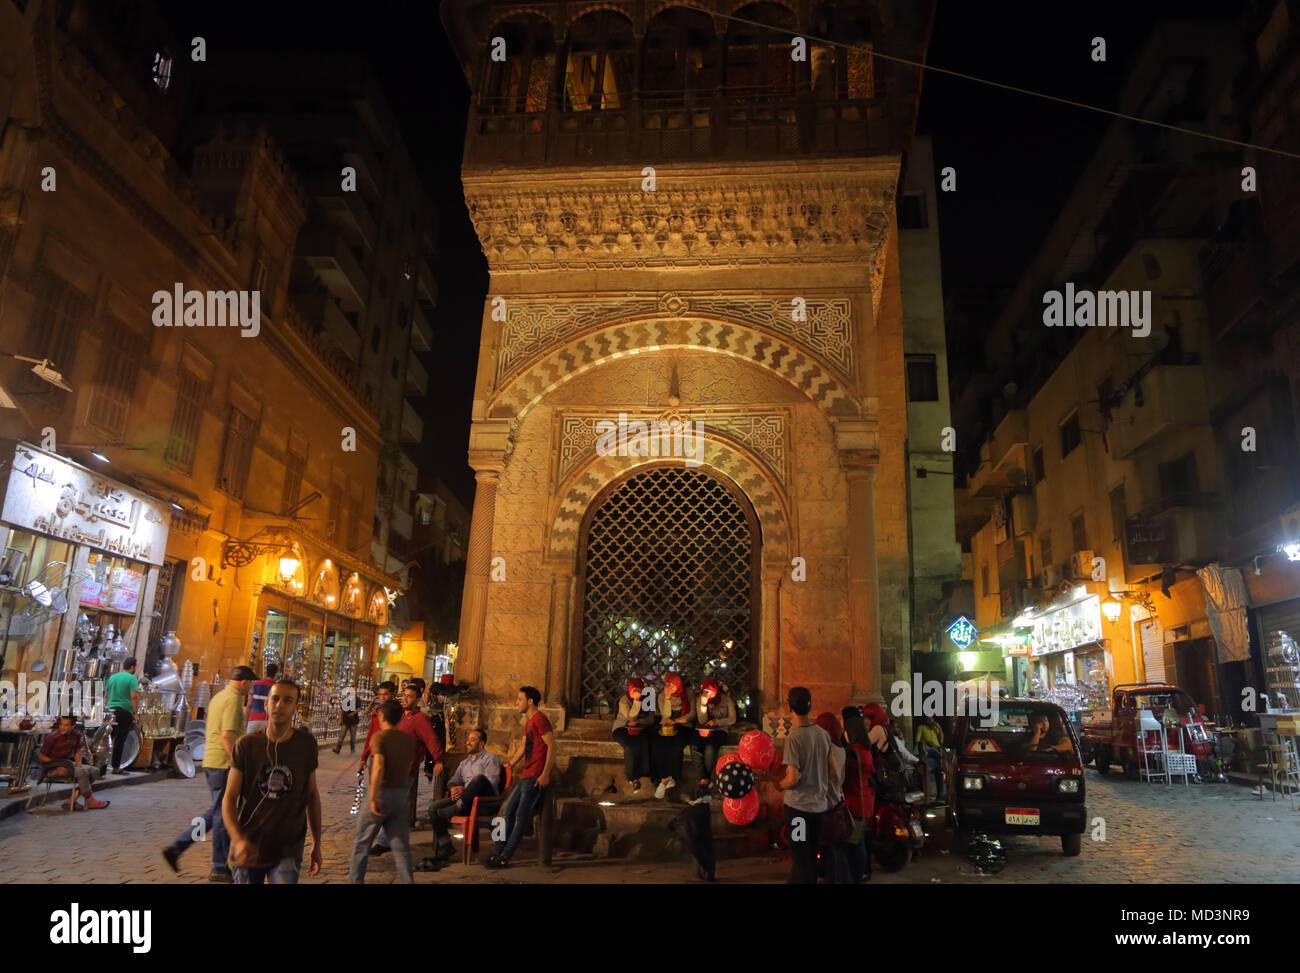 Historic Cairo A Walk through the Islamic City